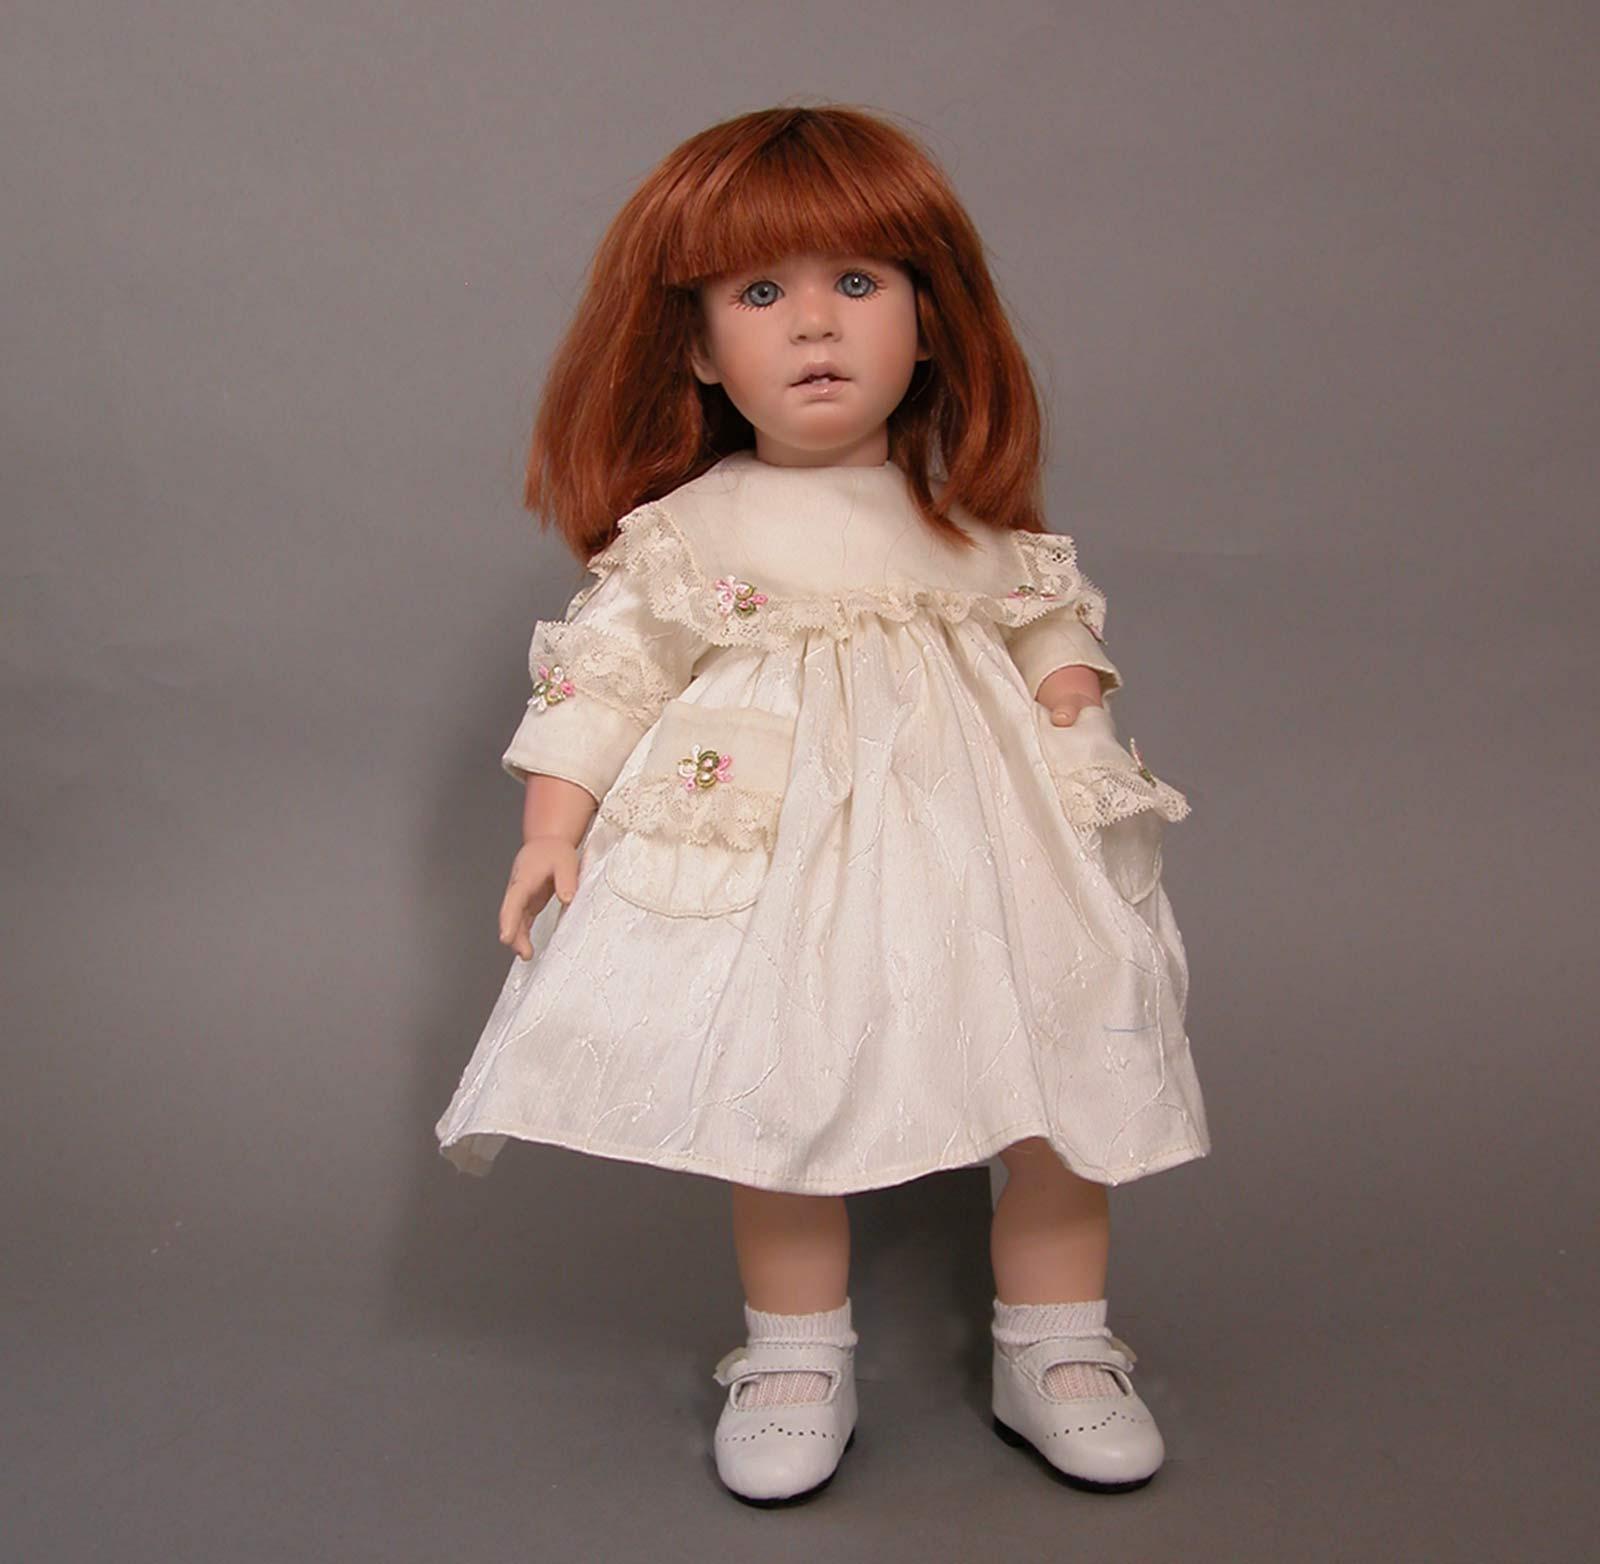 Ruth Treffeisen Doll Studio Carla Carla s and her enchanting